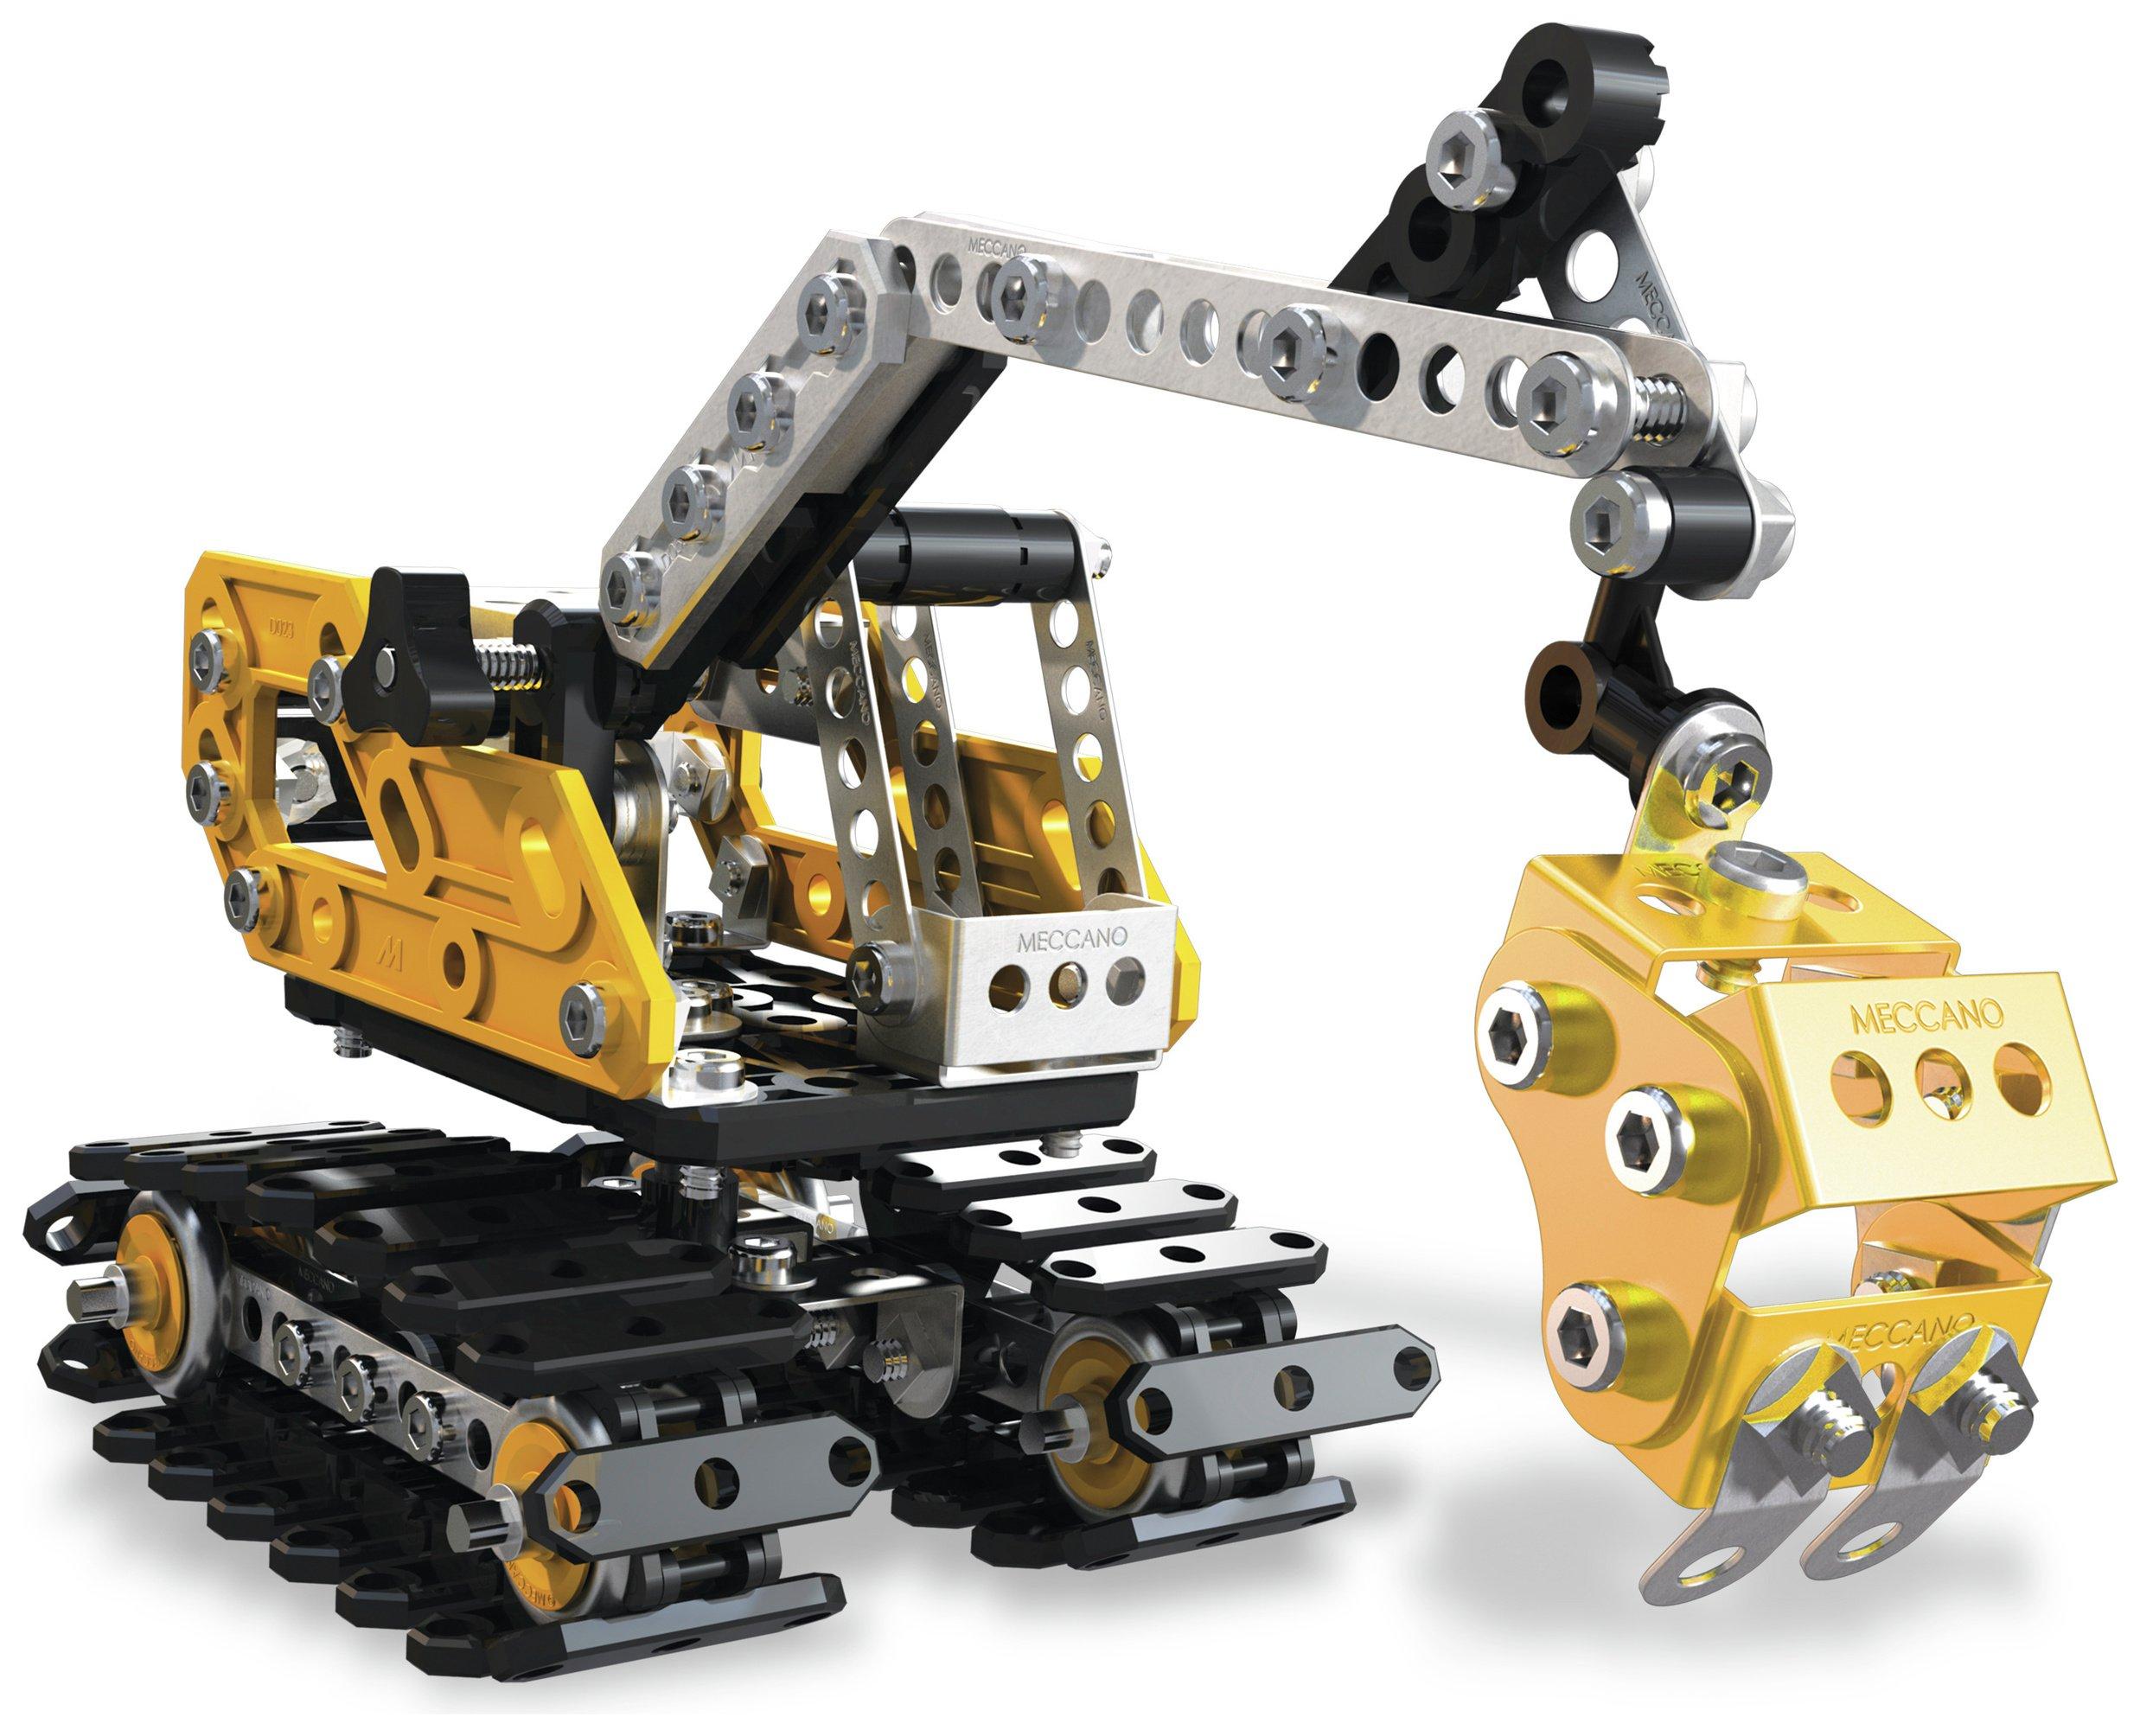 Meccano Excavator 2-in-1 Model Set.